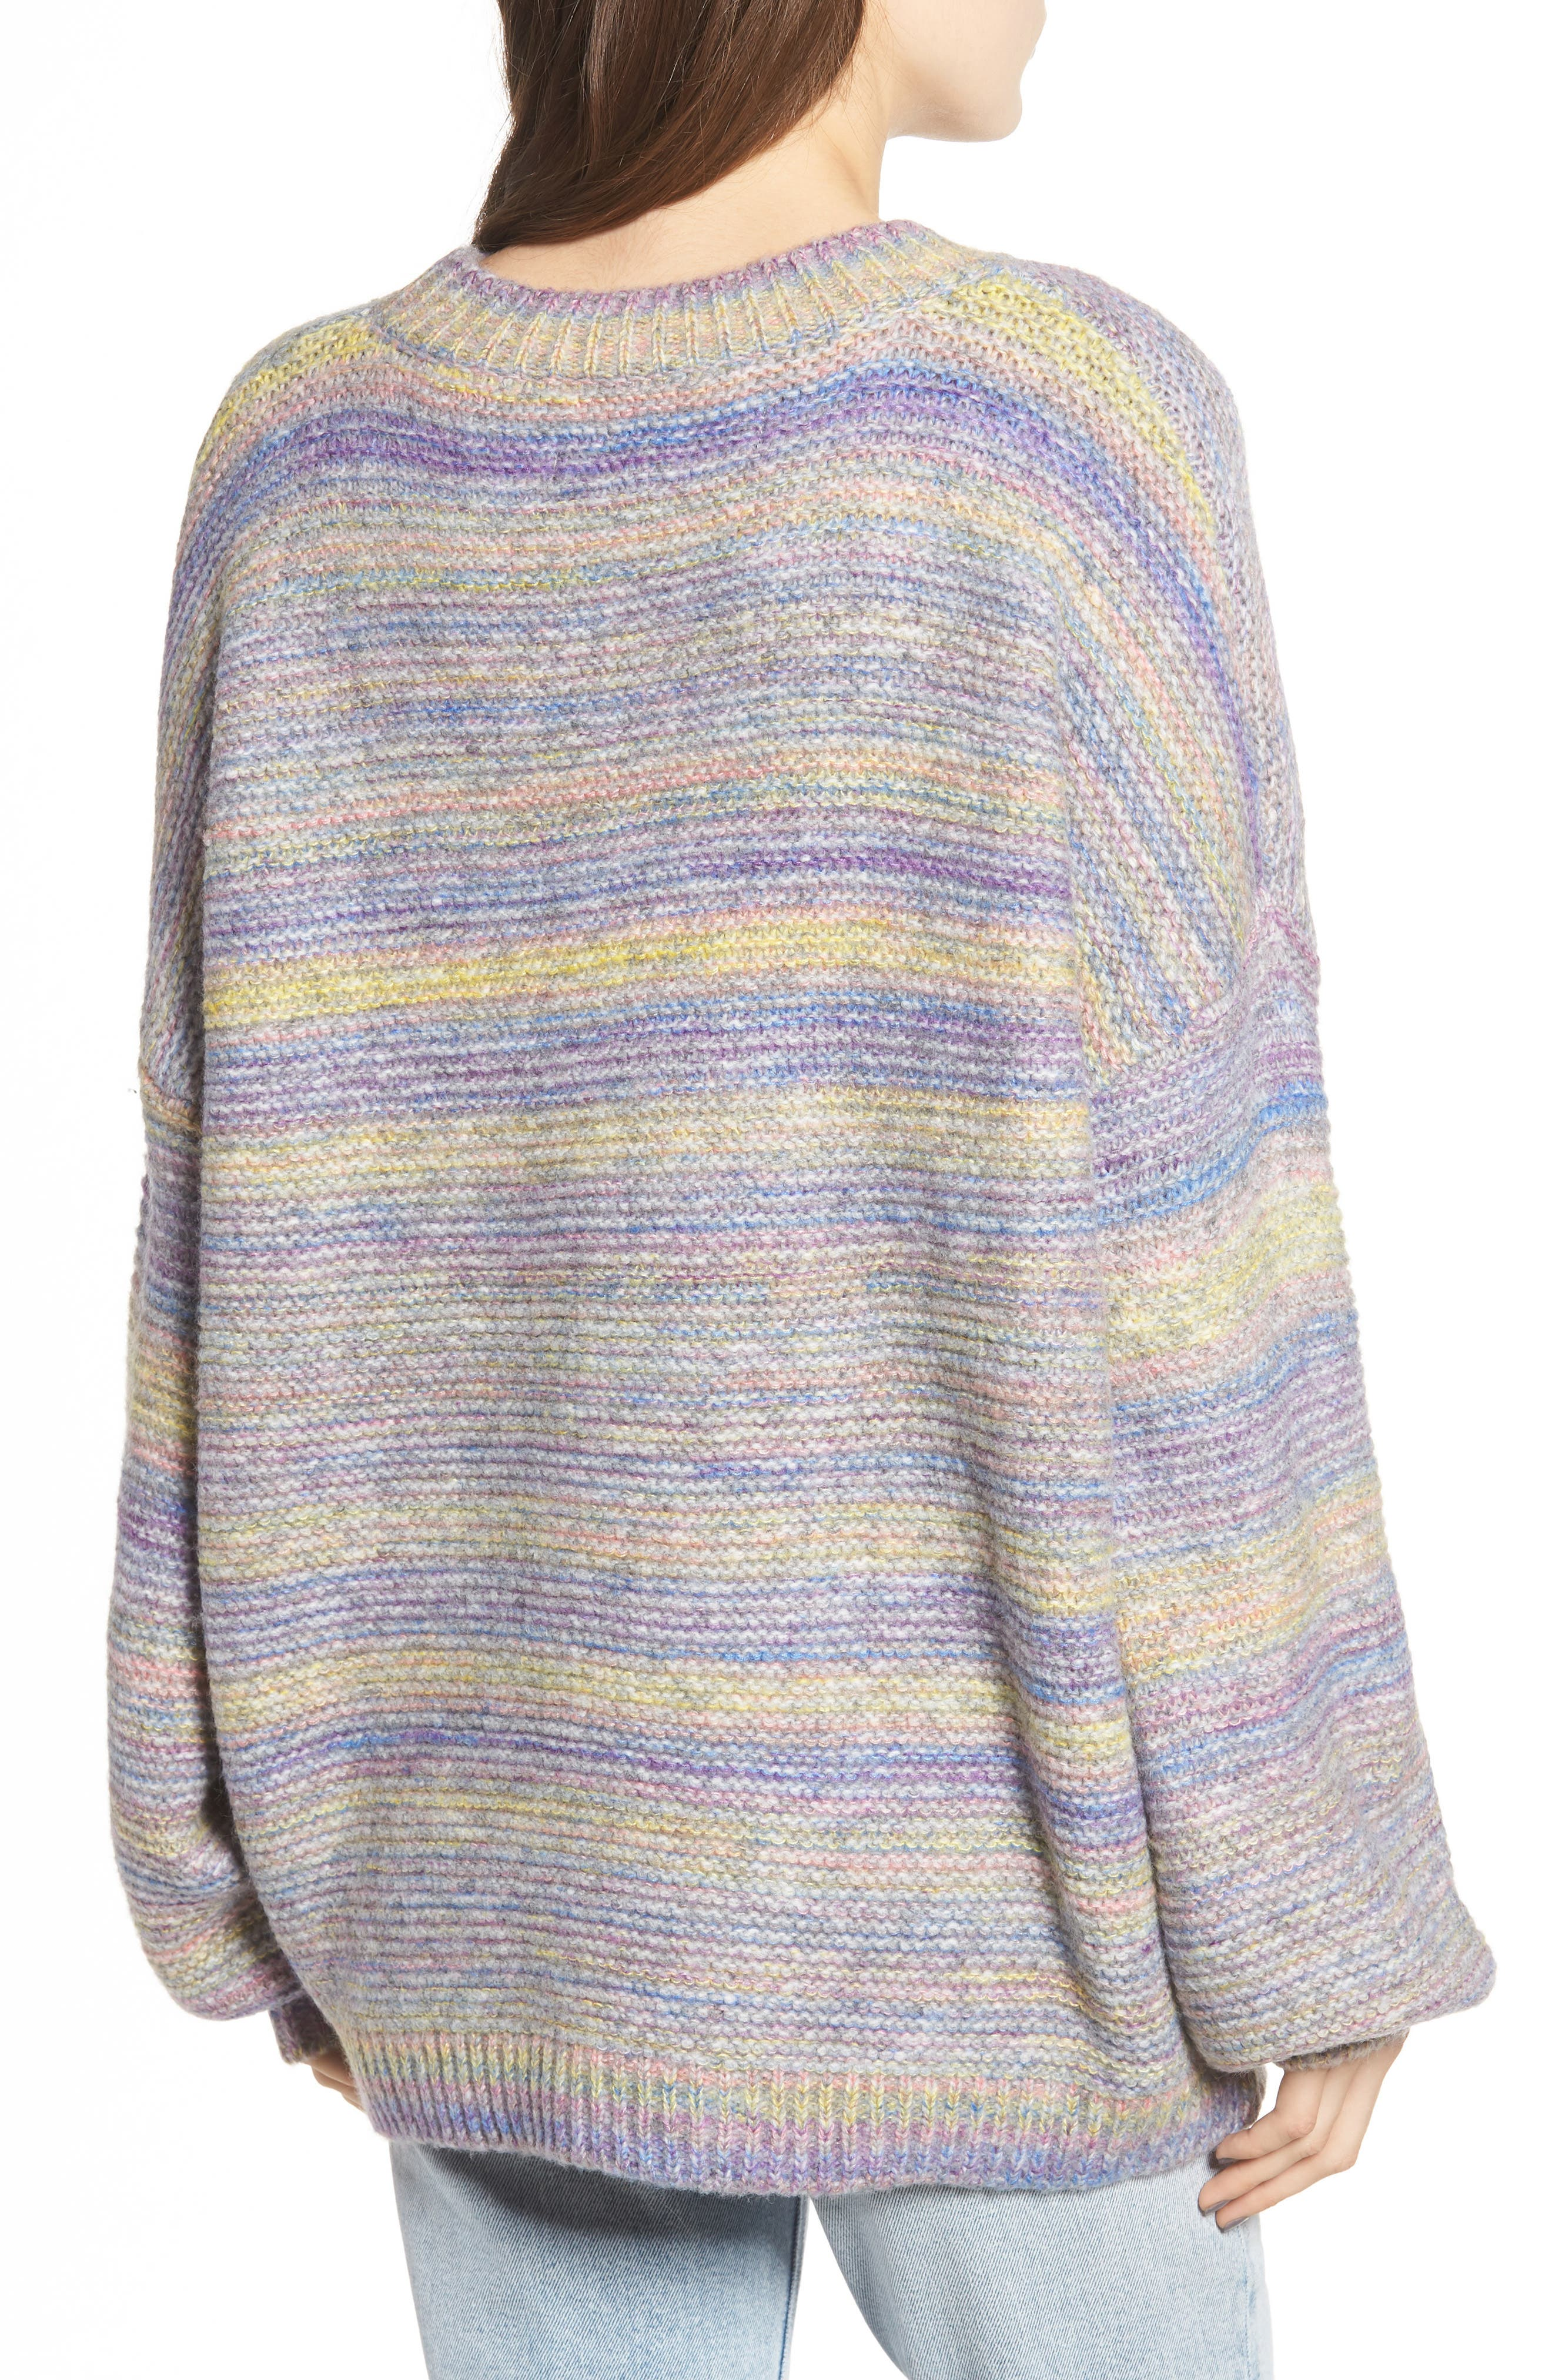 PROSPERITY DENIM, Rainbow Marl Sweater, Alternate thumbnail 2, color, YELLOW